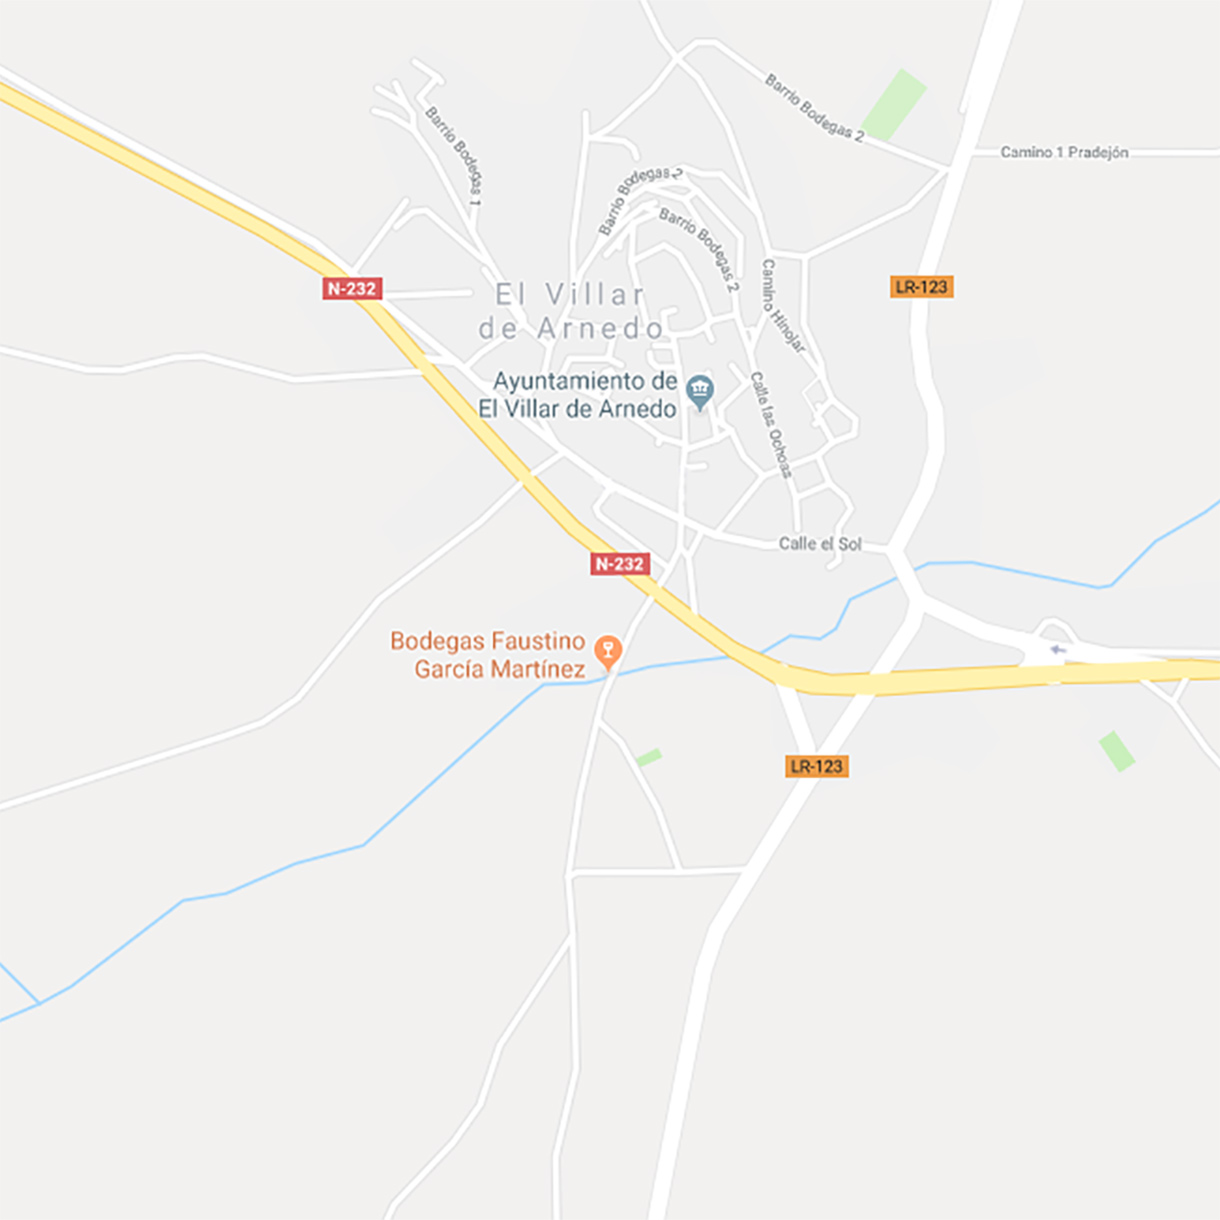 Acceder a Google Maps (Abre en nueva ventana)